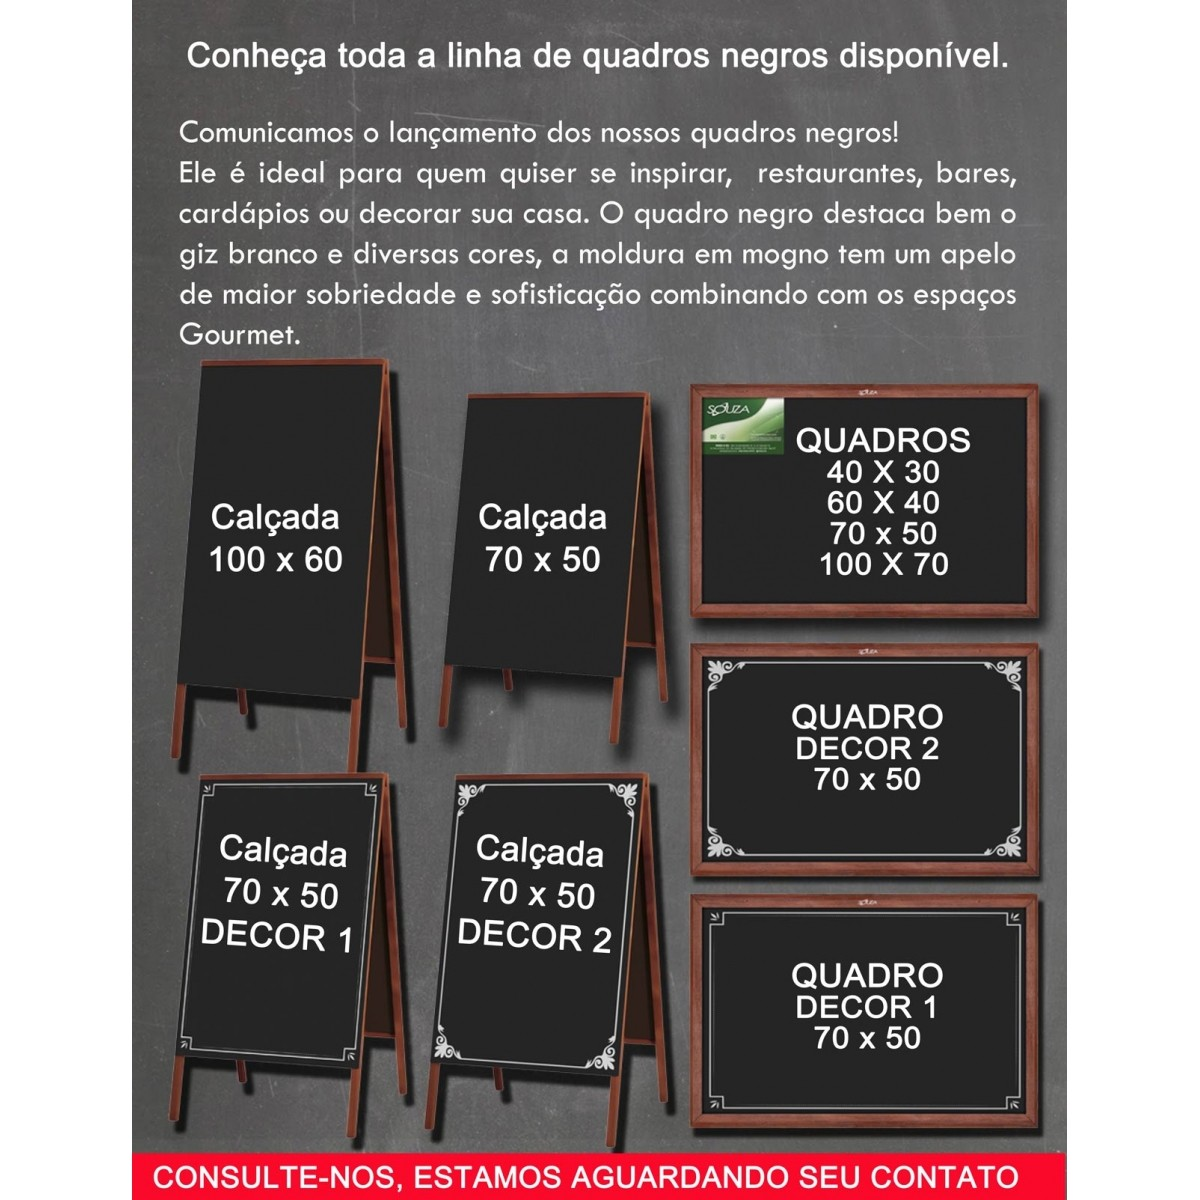 Quadro Negro Moldura Madeira Cor MOGNO 40 X 30 cm Referência 2101 - SOUZA